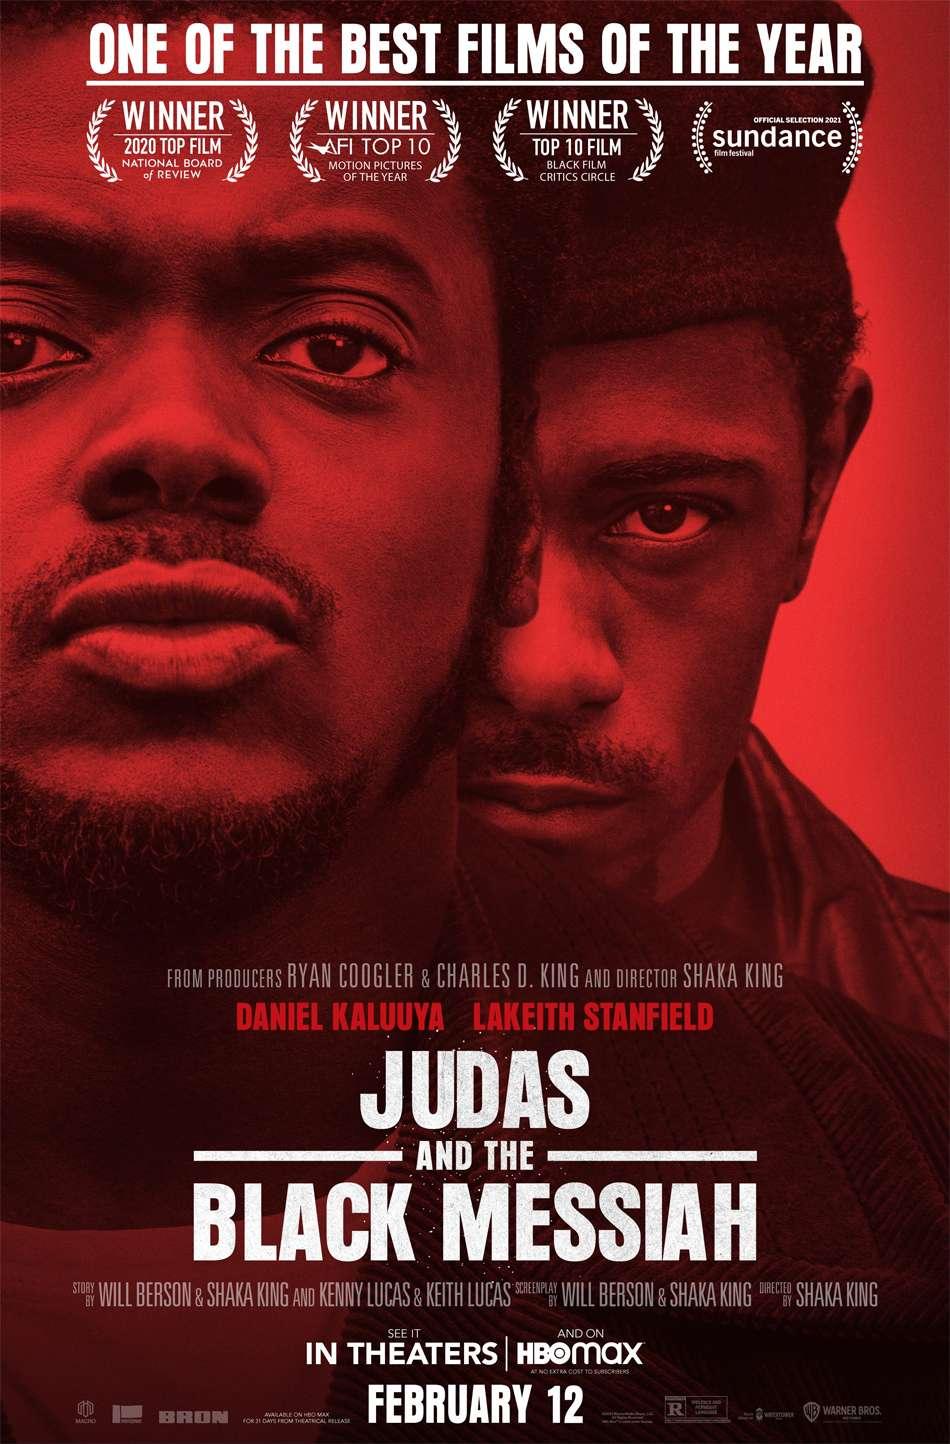 Judas and the Black Messiah Poster Πόστερ